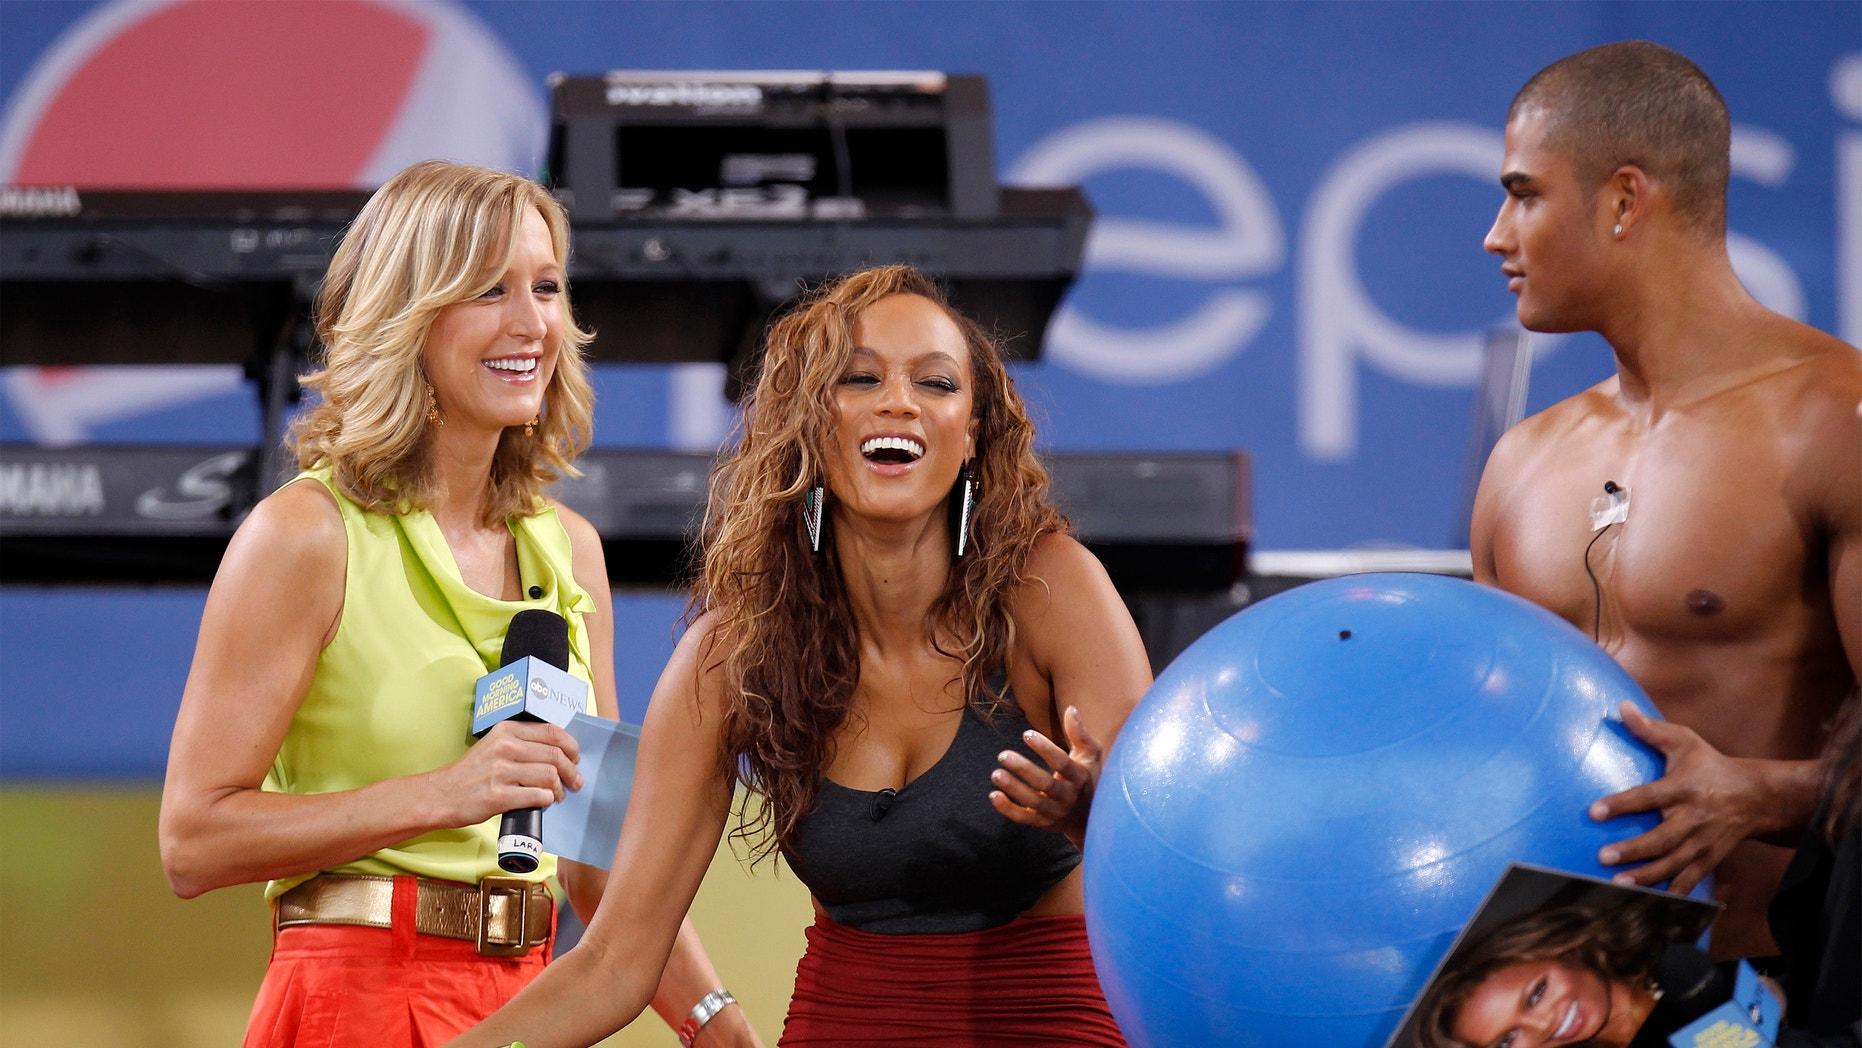 Lara Spencer hosts a 'GMA' segment featuring Tyra Banks.